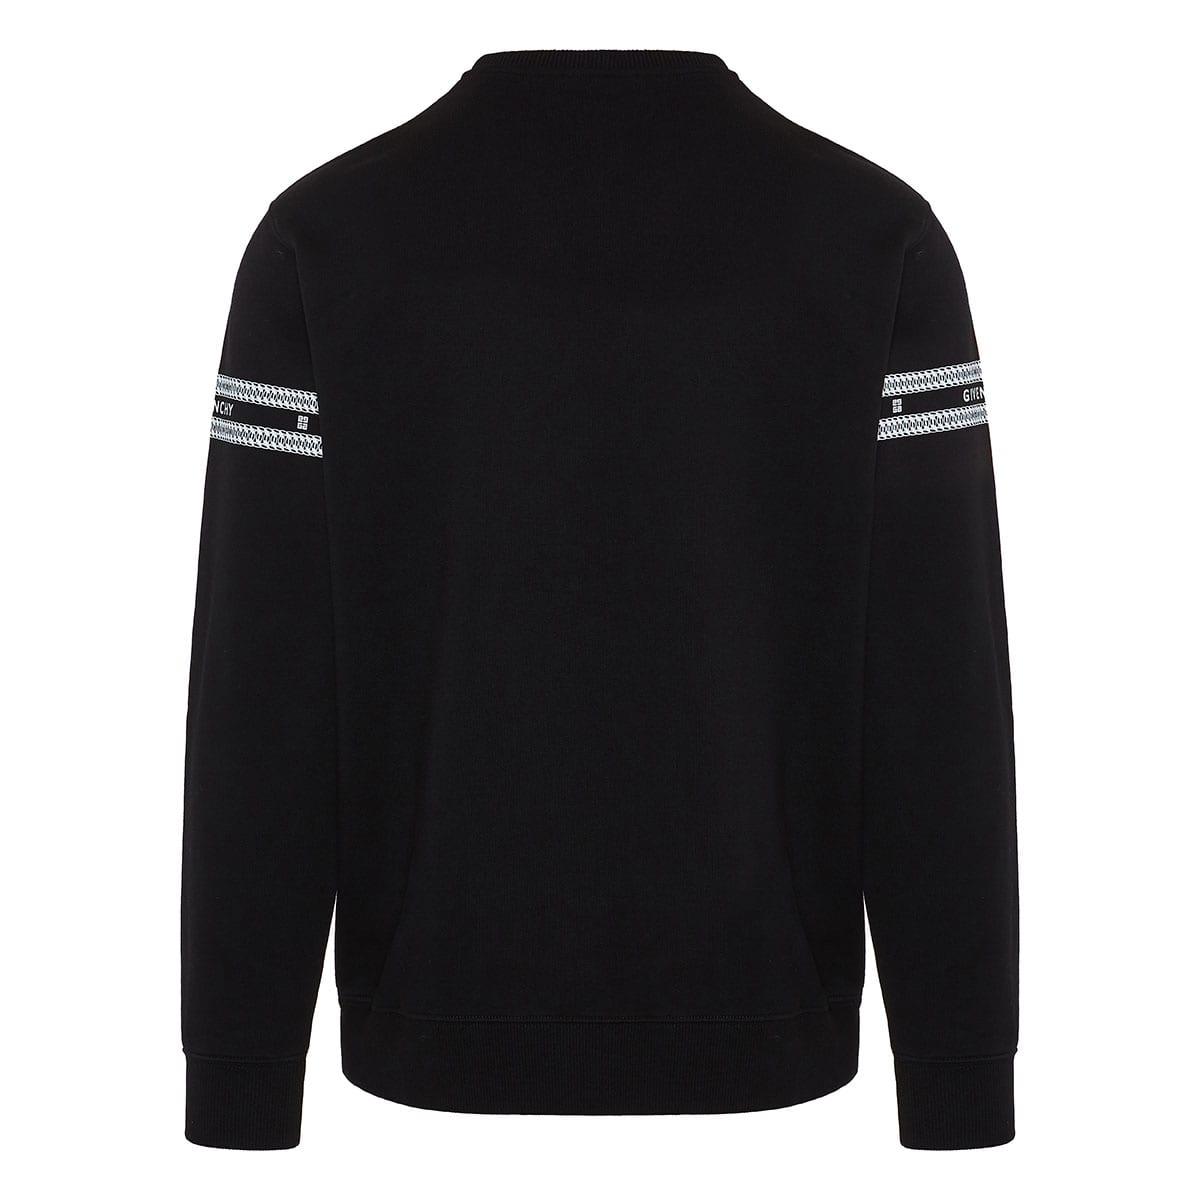 Chain print logo sweatshirt